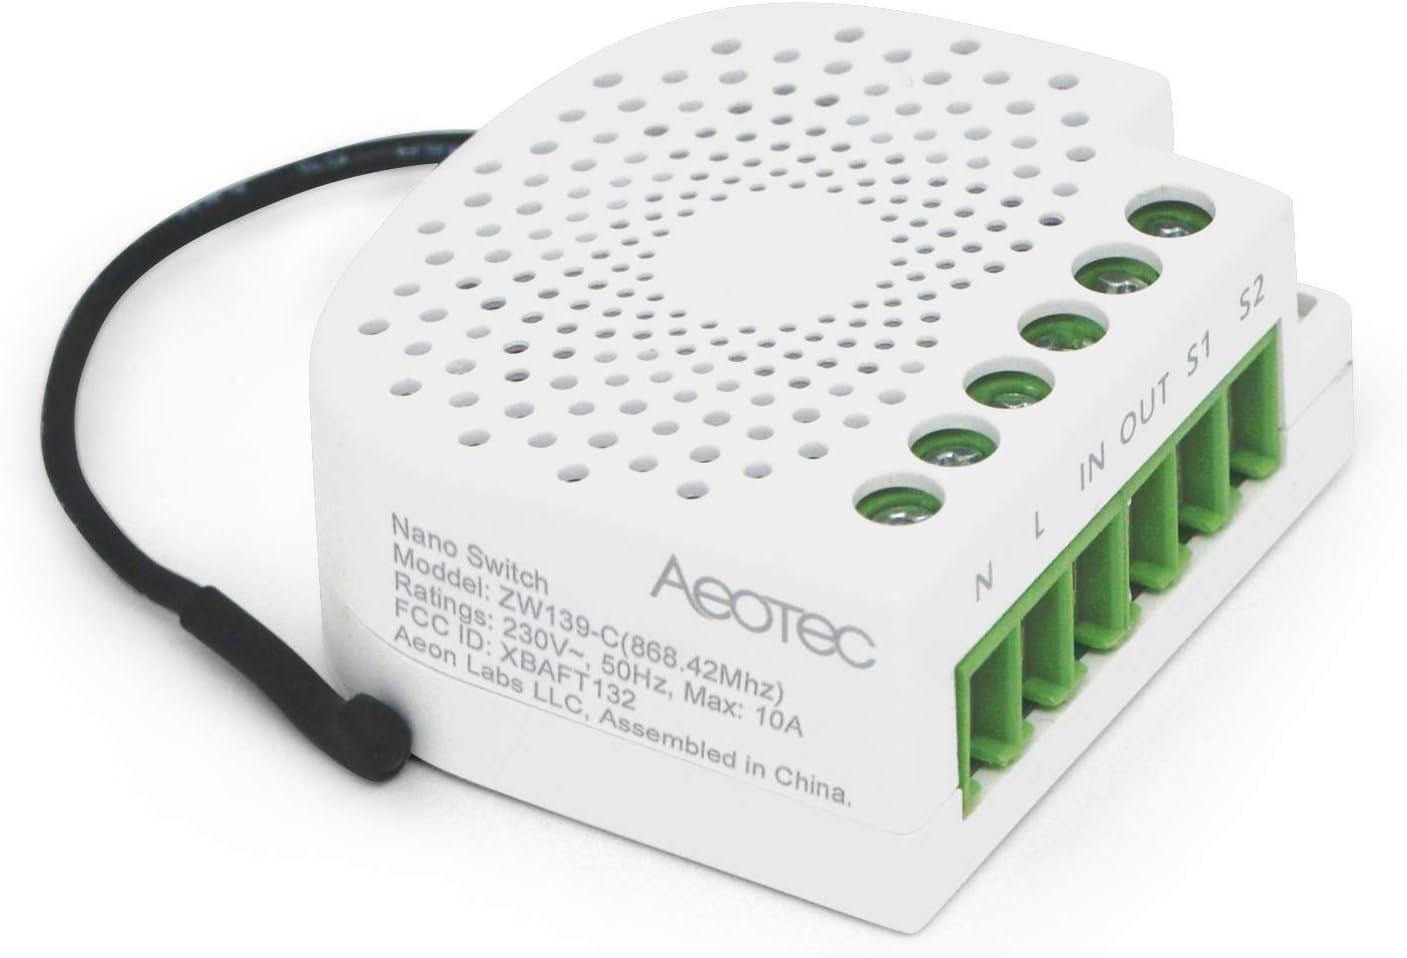 ZW111 1.2A Neutral Opcional Z-Wave Plus Atenuador de Pared para LED Aeotec ZW111-C Nano Dimmer Lectura de Consumo de Energ/ía Hal/ógeno Luces Fluorescentes 240 V Incandescente Blanco